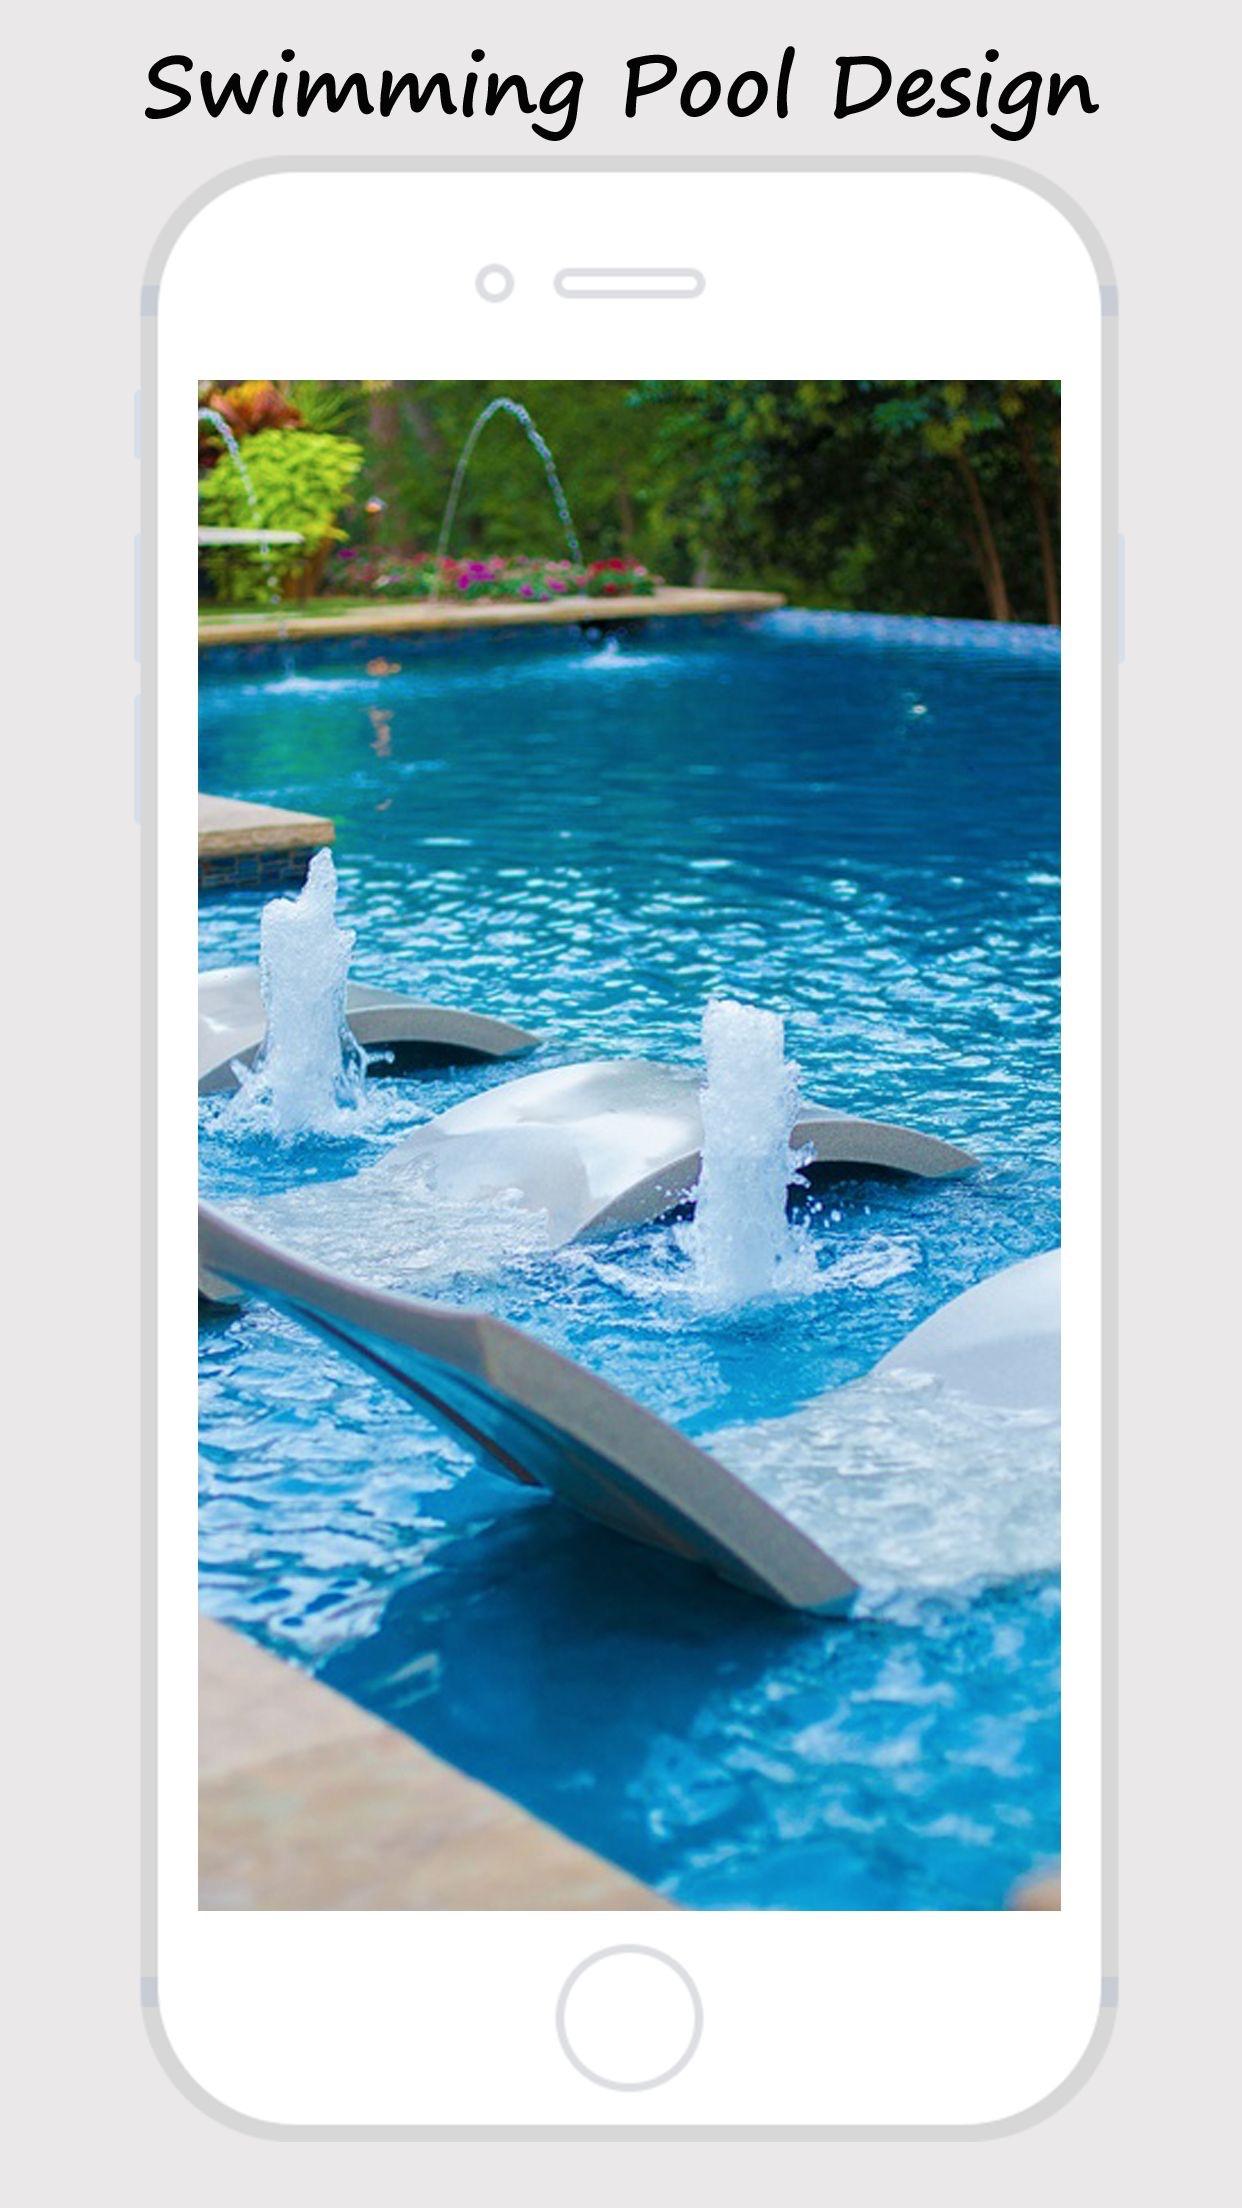 Swimming Pool Design Ideas - Cool Pool Design Pictures Screenshot